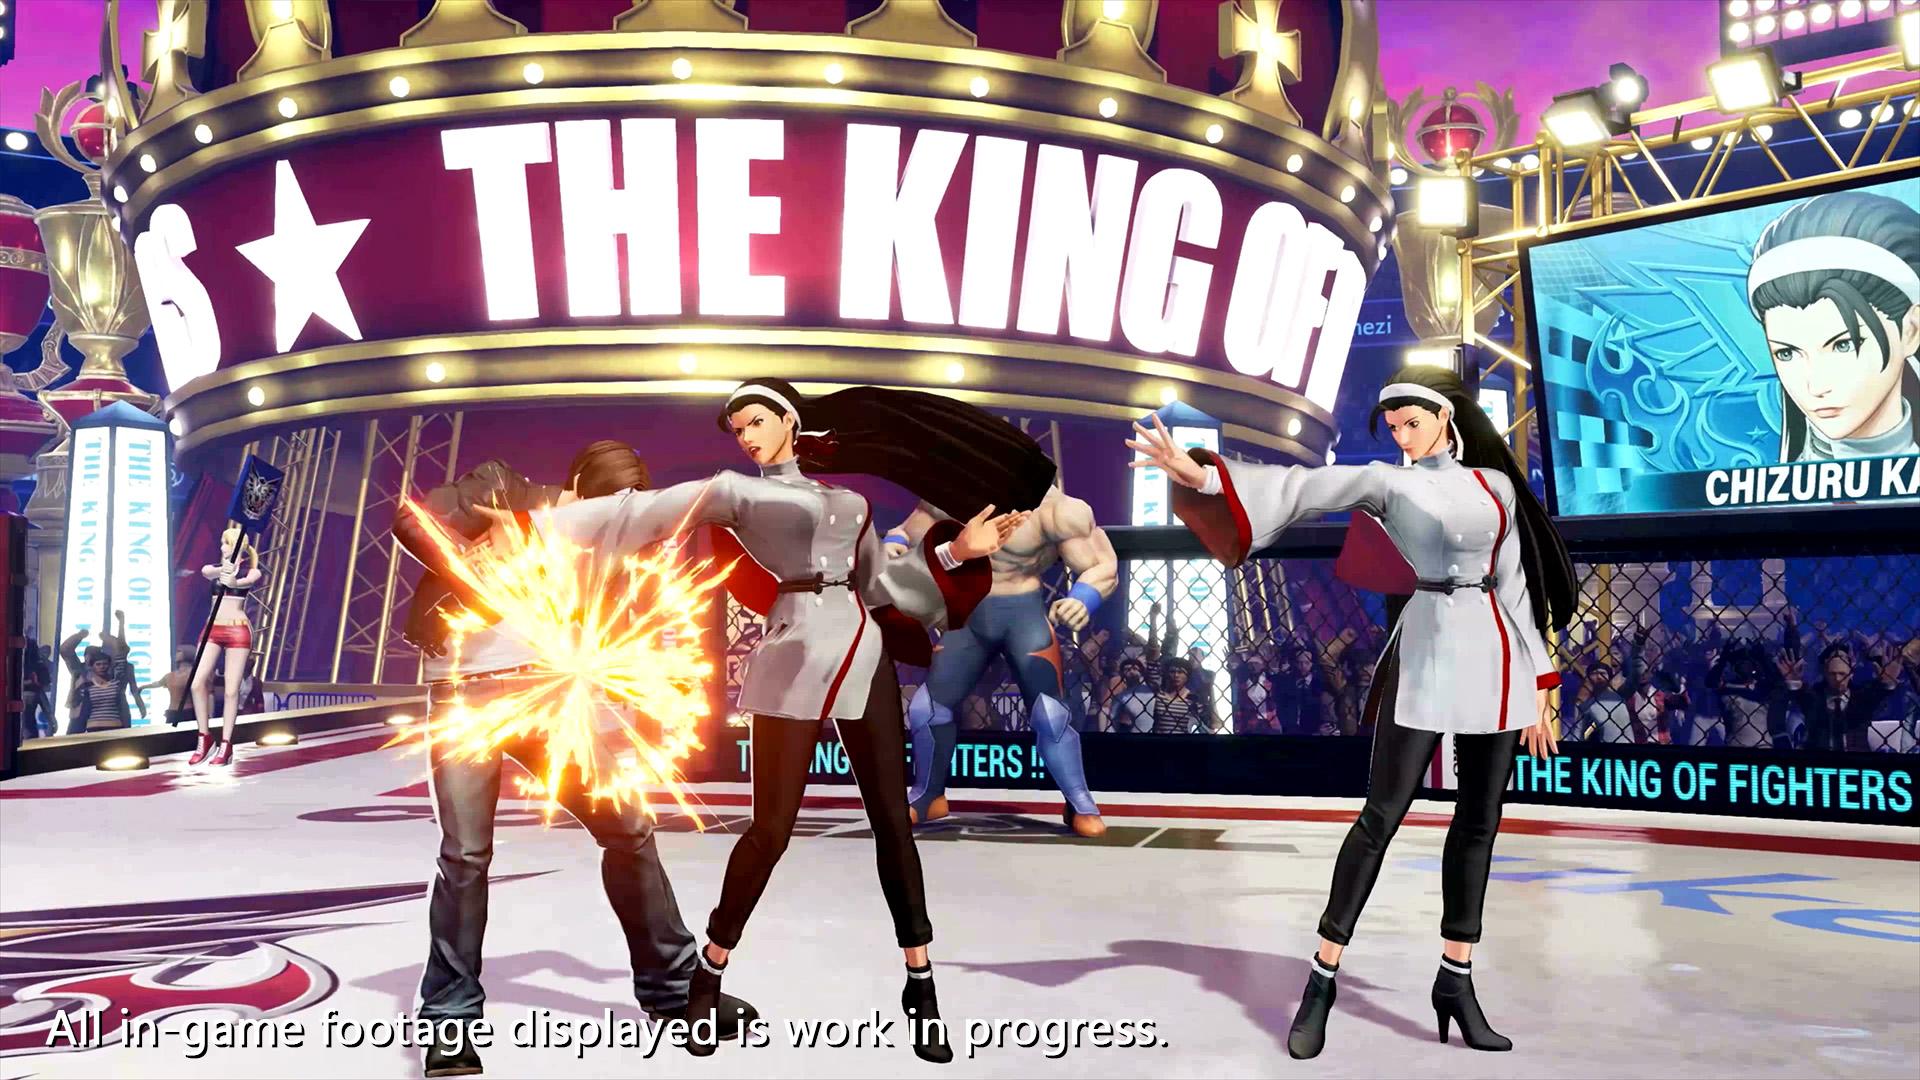 The King of Fighters XV Chizuru Kagura Screen 5